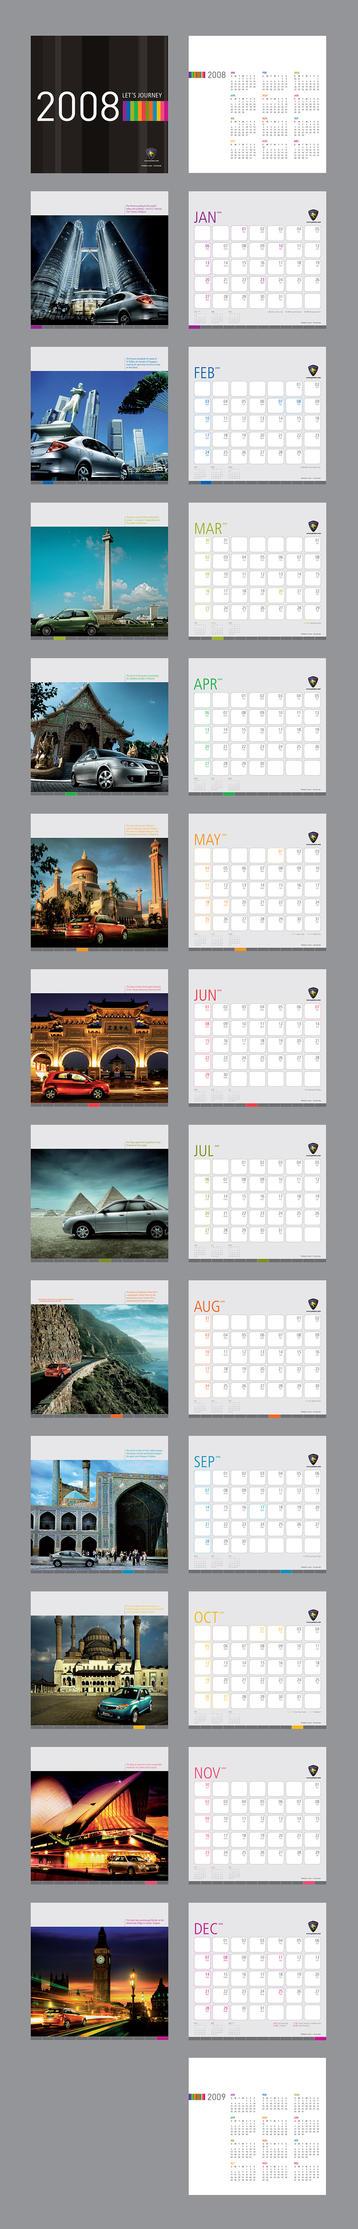 Proton Calendar 2008 by yienkeat